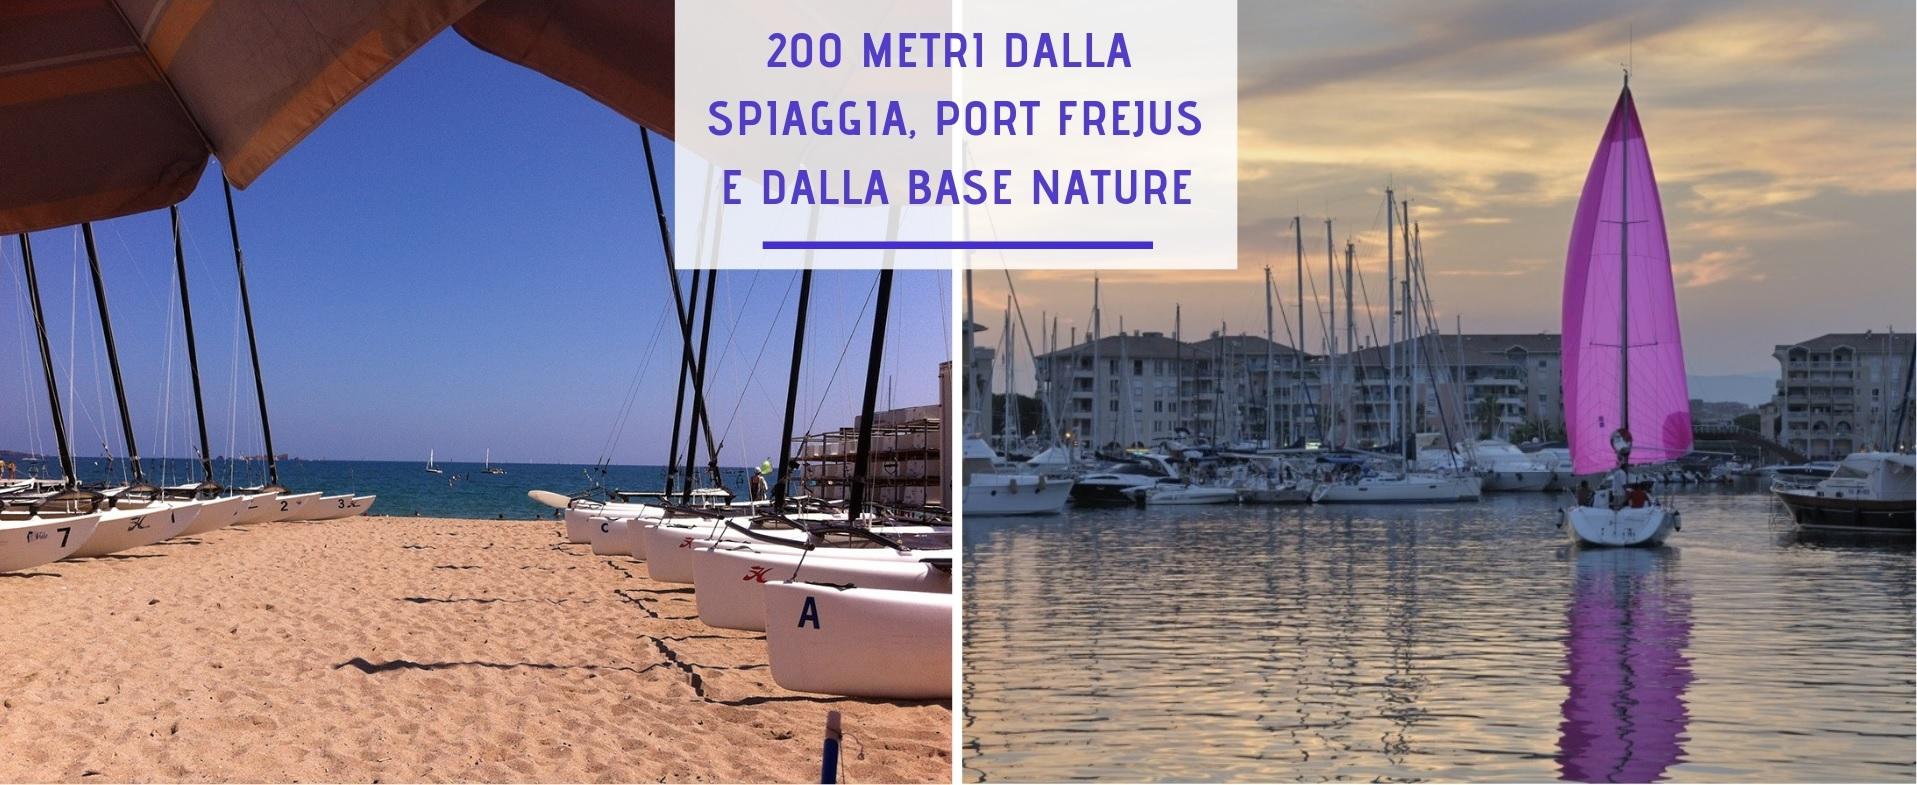 A 200 m plage italien